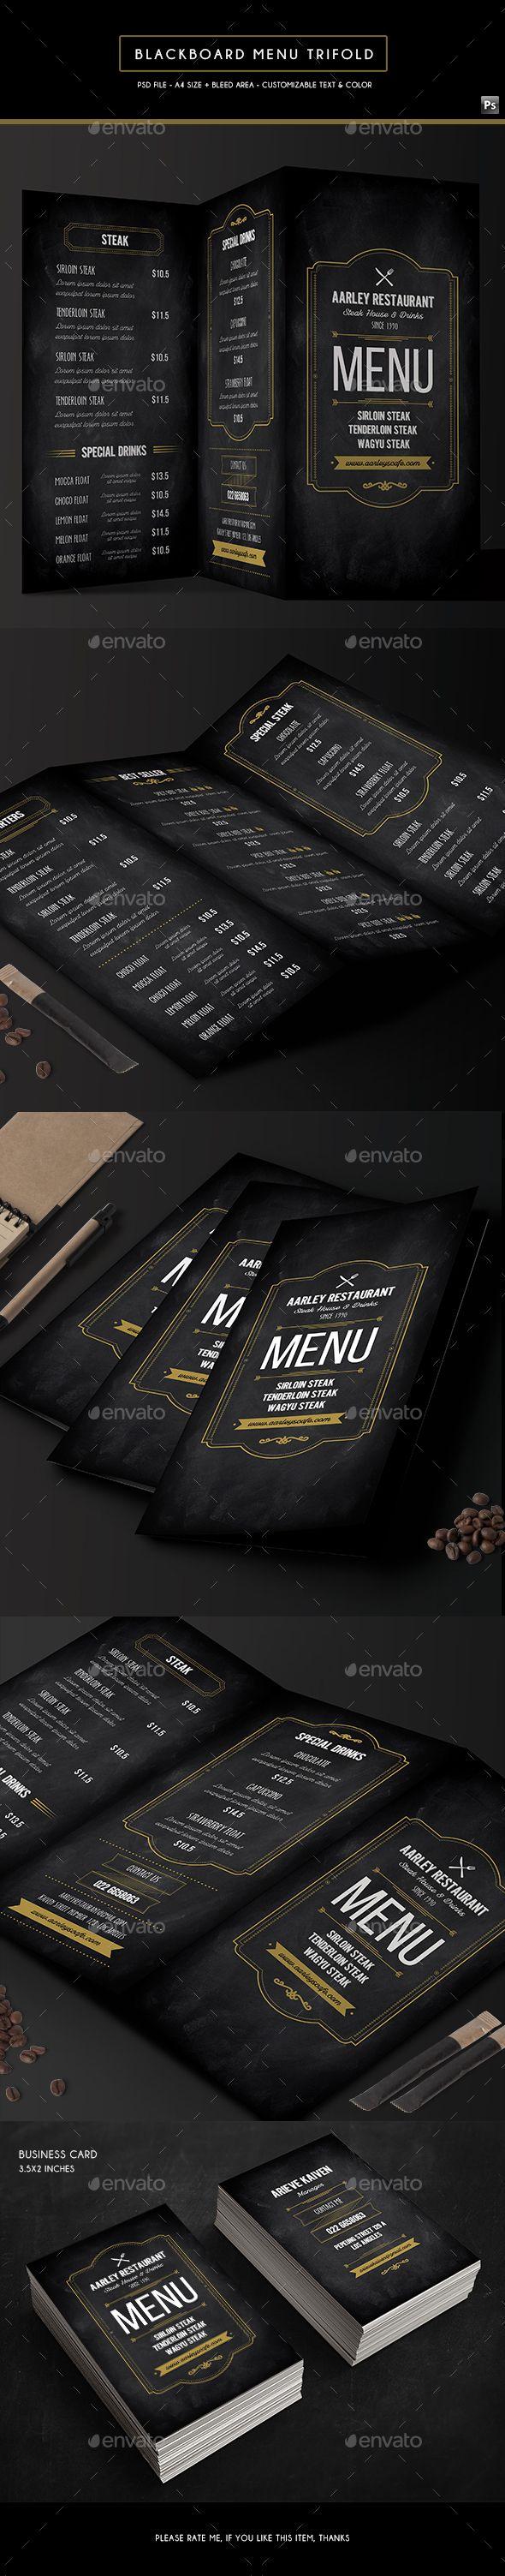 Blackboard Food Menu Trifold Business Card Food Menu Card - Tri fold business card template